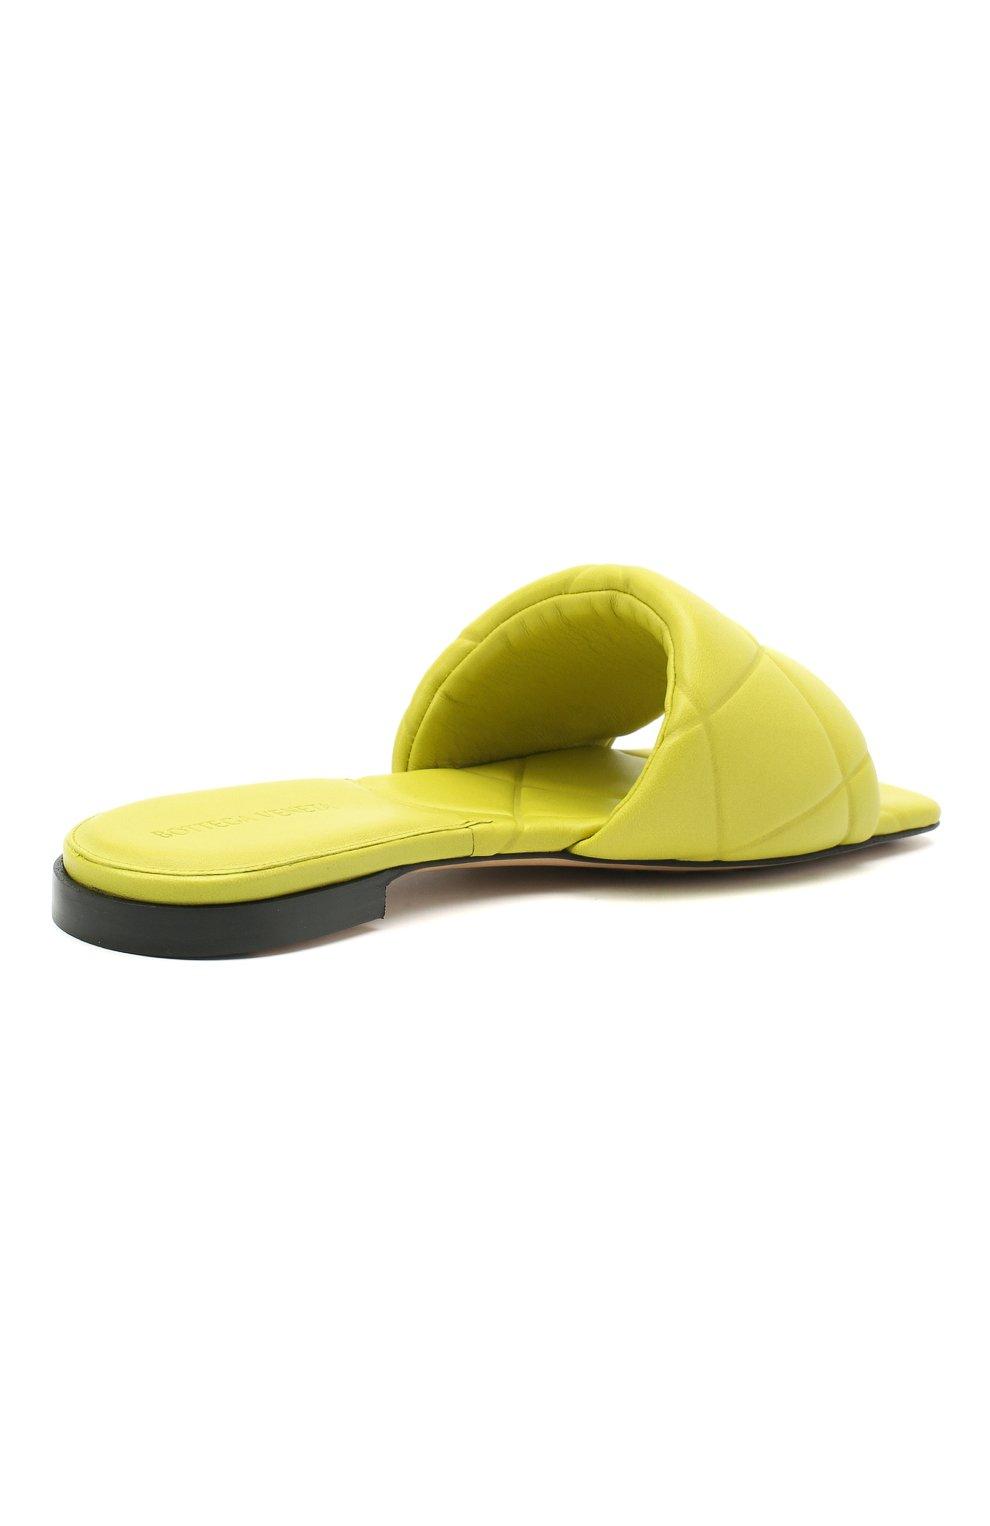 Женские кожаные шлепанцы bv rubber BOTTEGA VENETA светло-зеленого цвета, арт. 639940/VBP30 | Фото 4